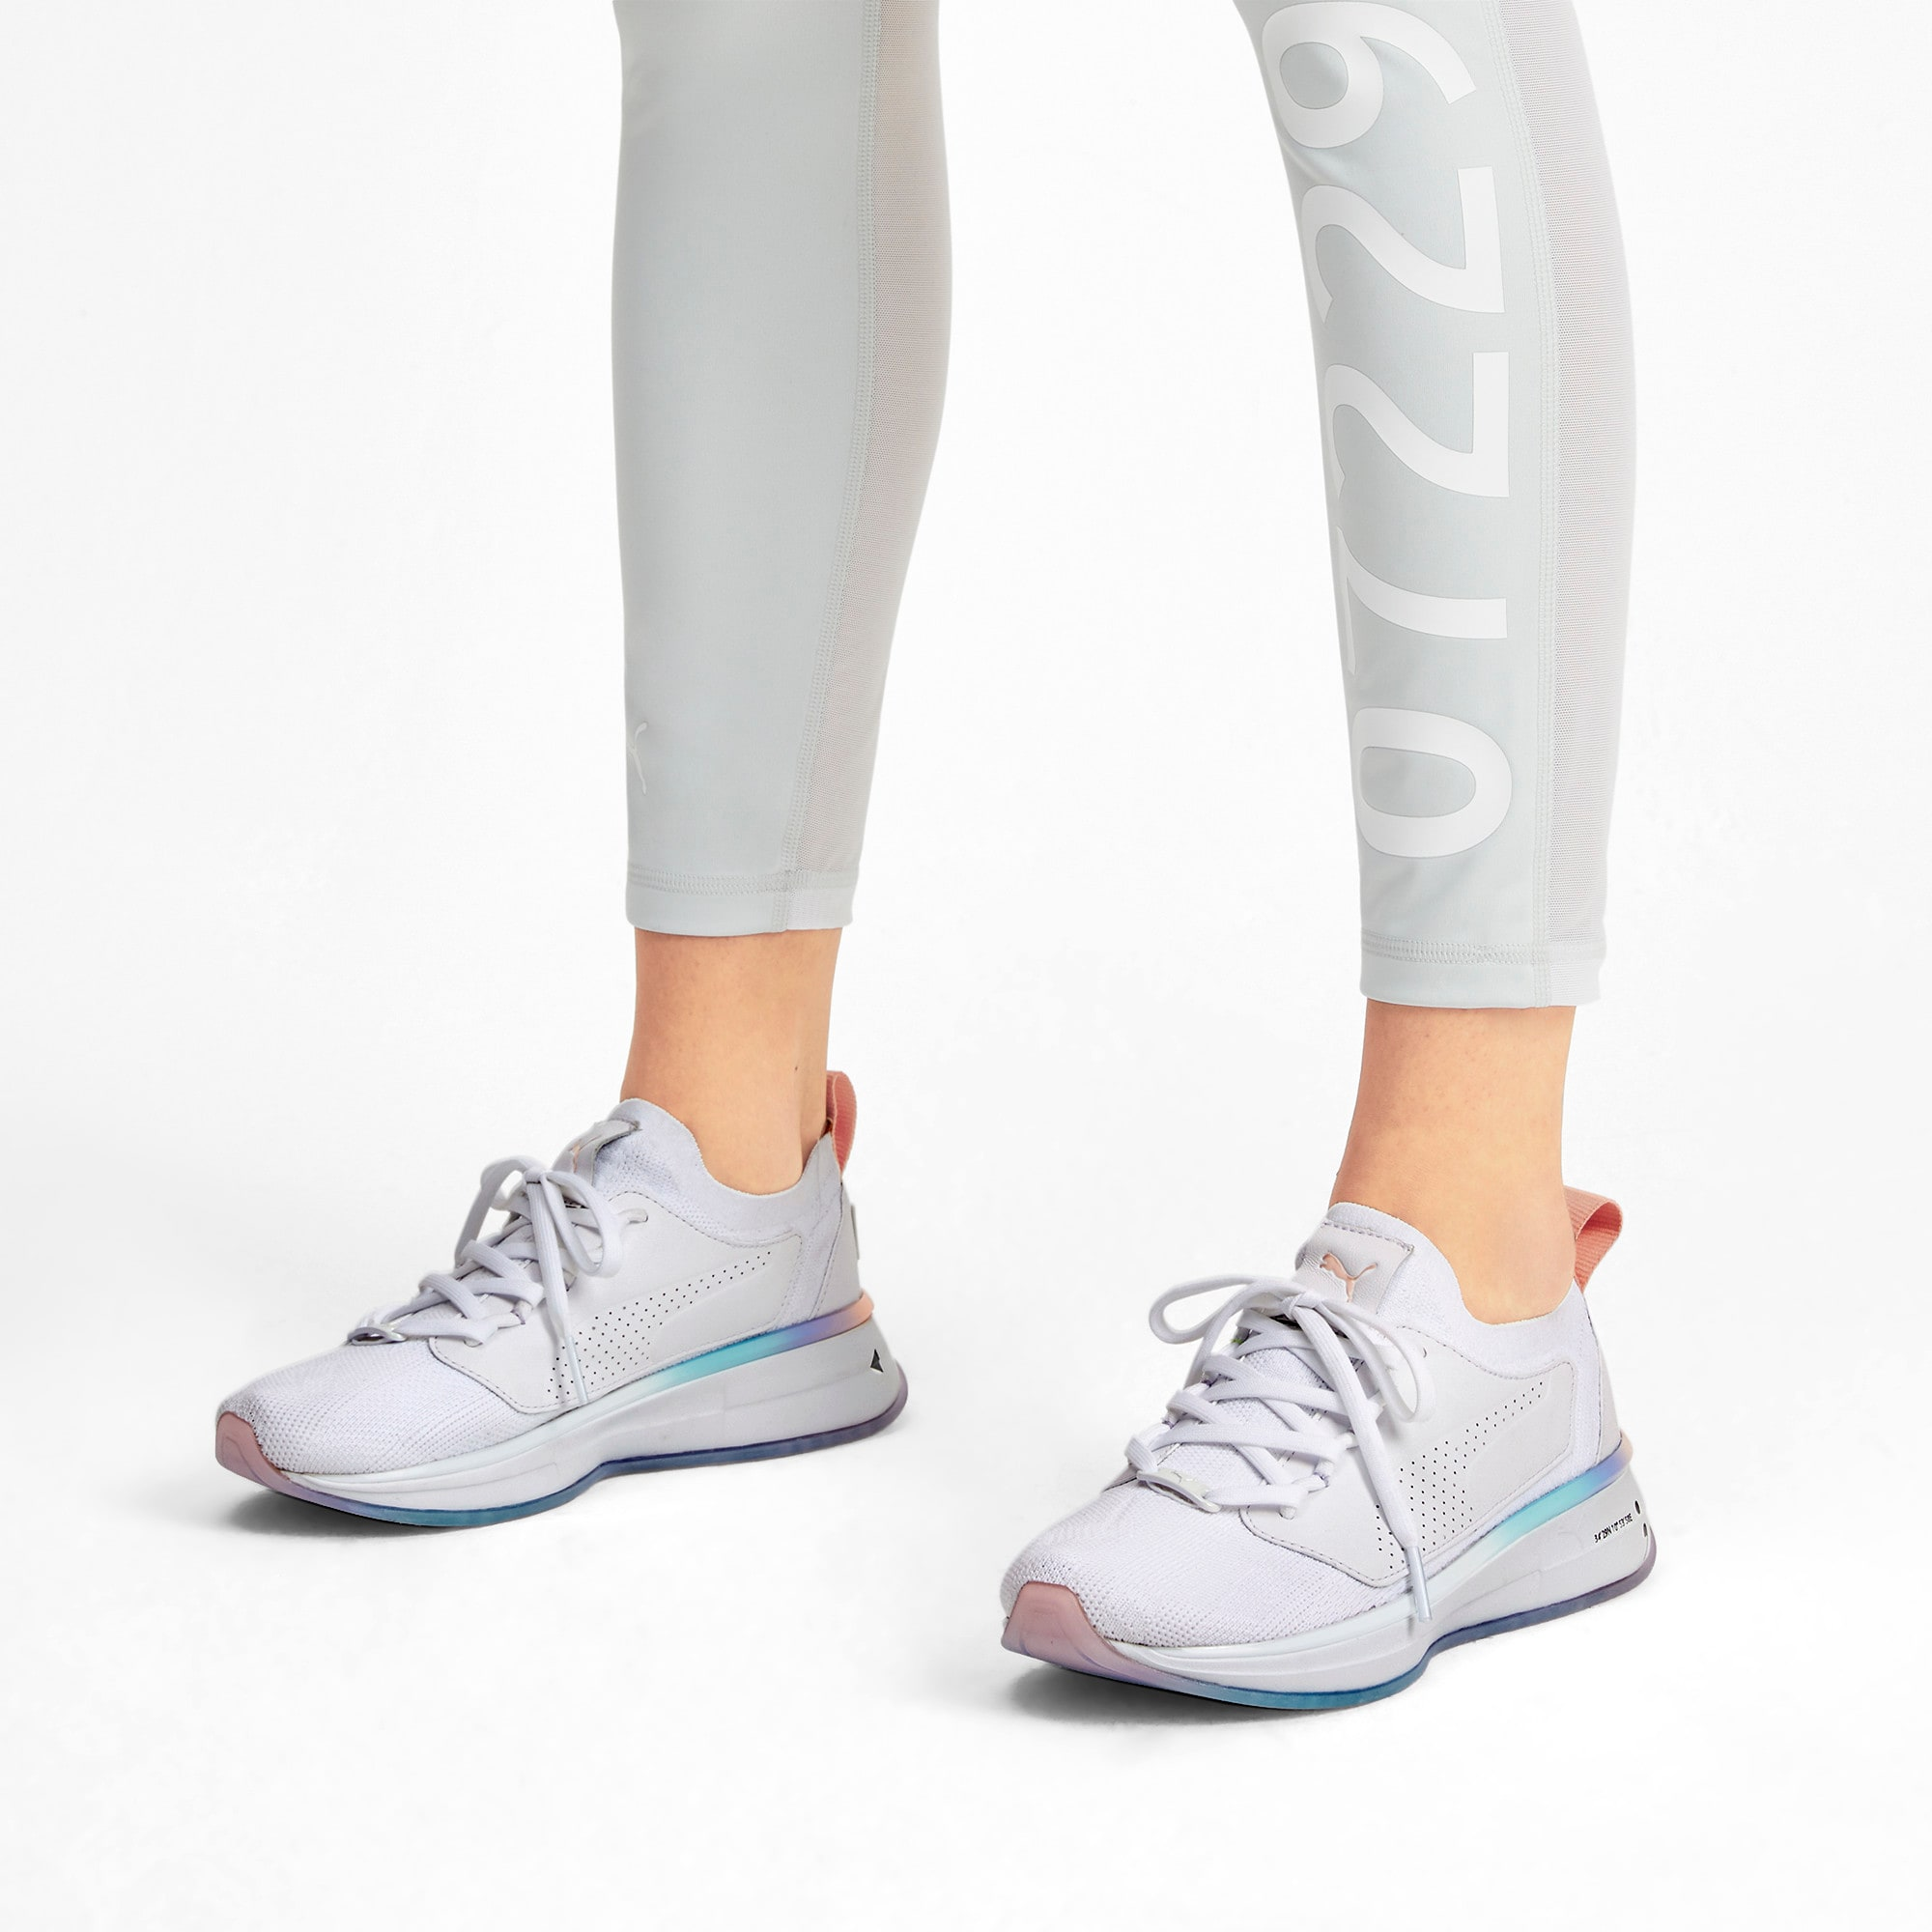 Thumbnail 2 of PUMA x SELENA GOMEZ Runner Women's Training Shoes, Puma White-Peach Bud, medium